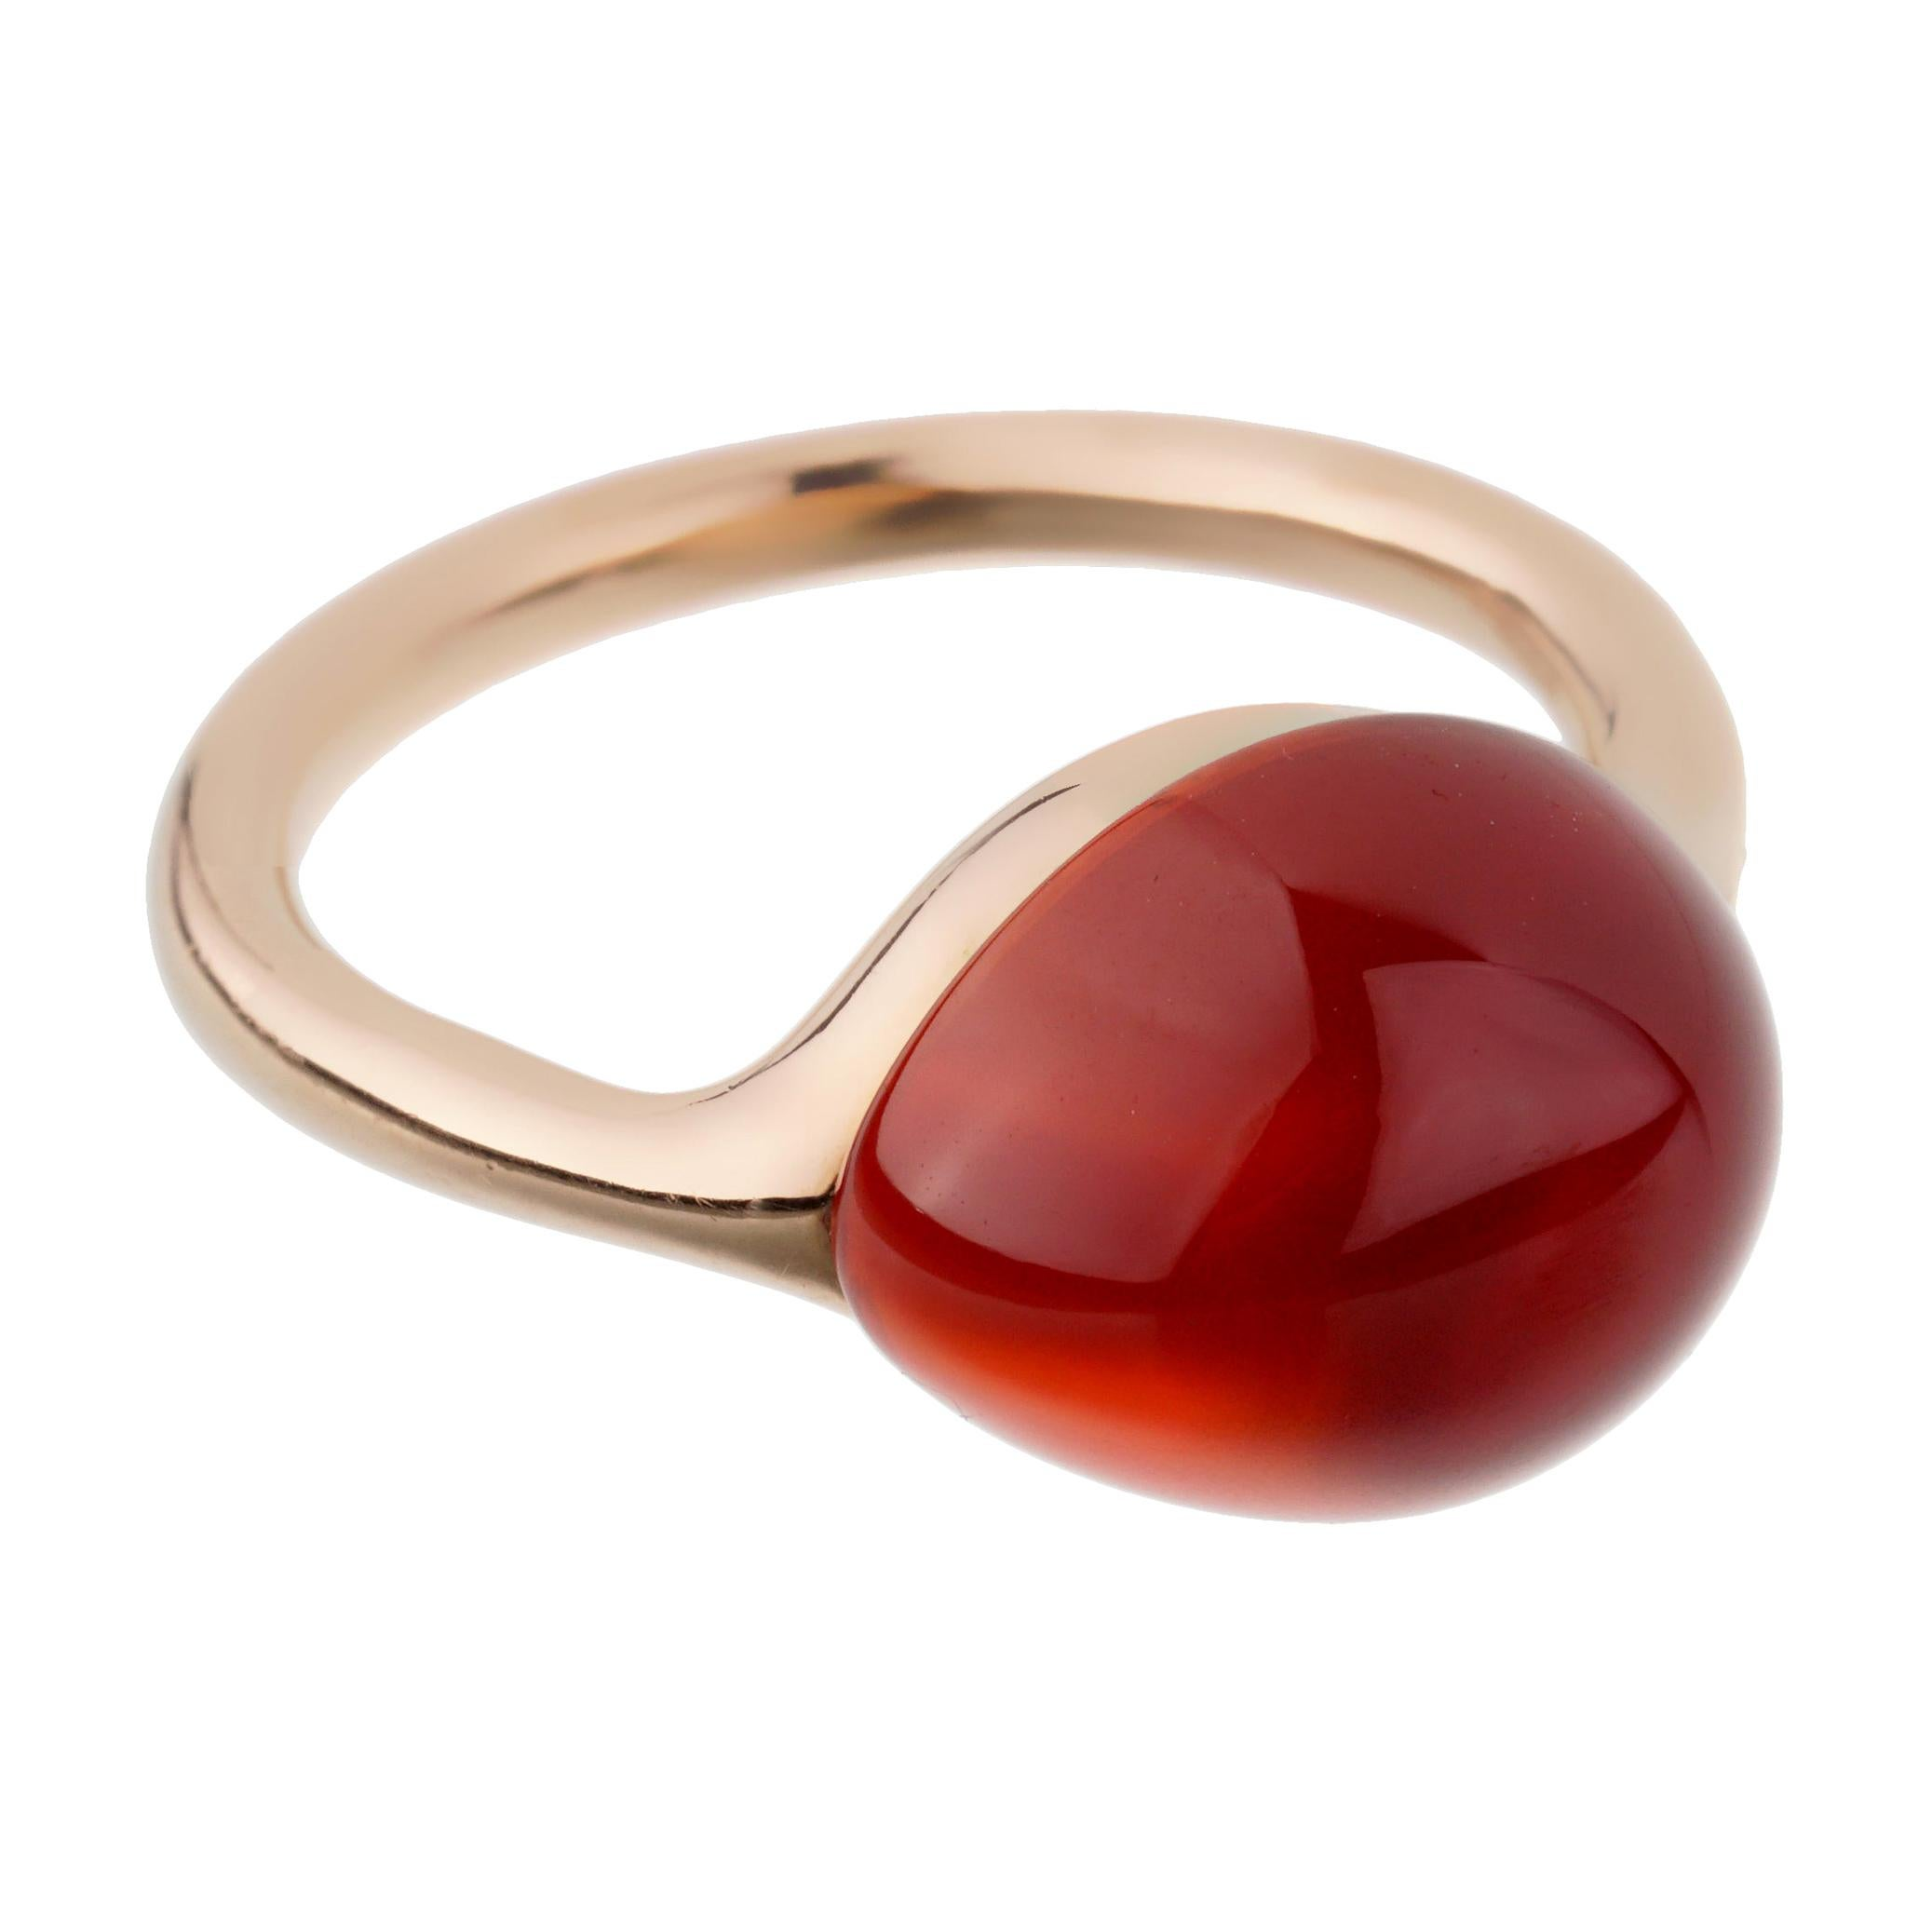 Pomellato Carnelian Rose Gold Cocktail Ring